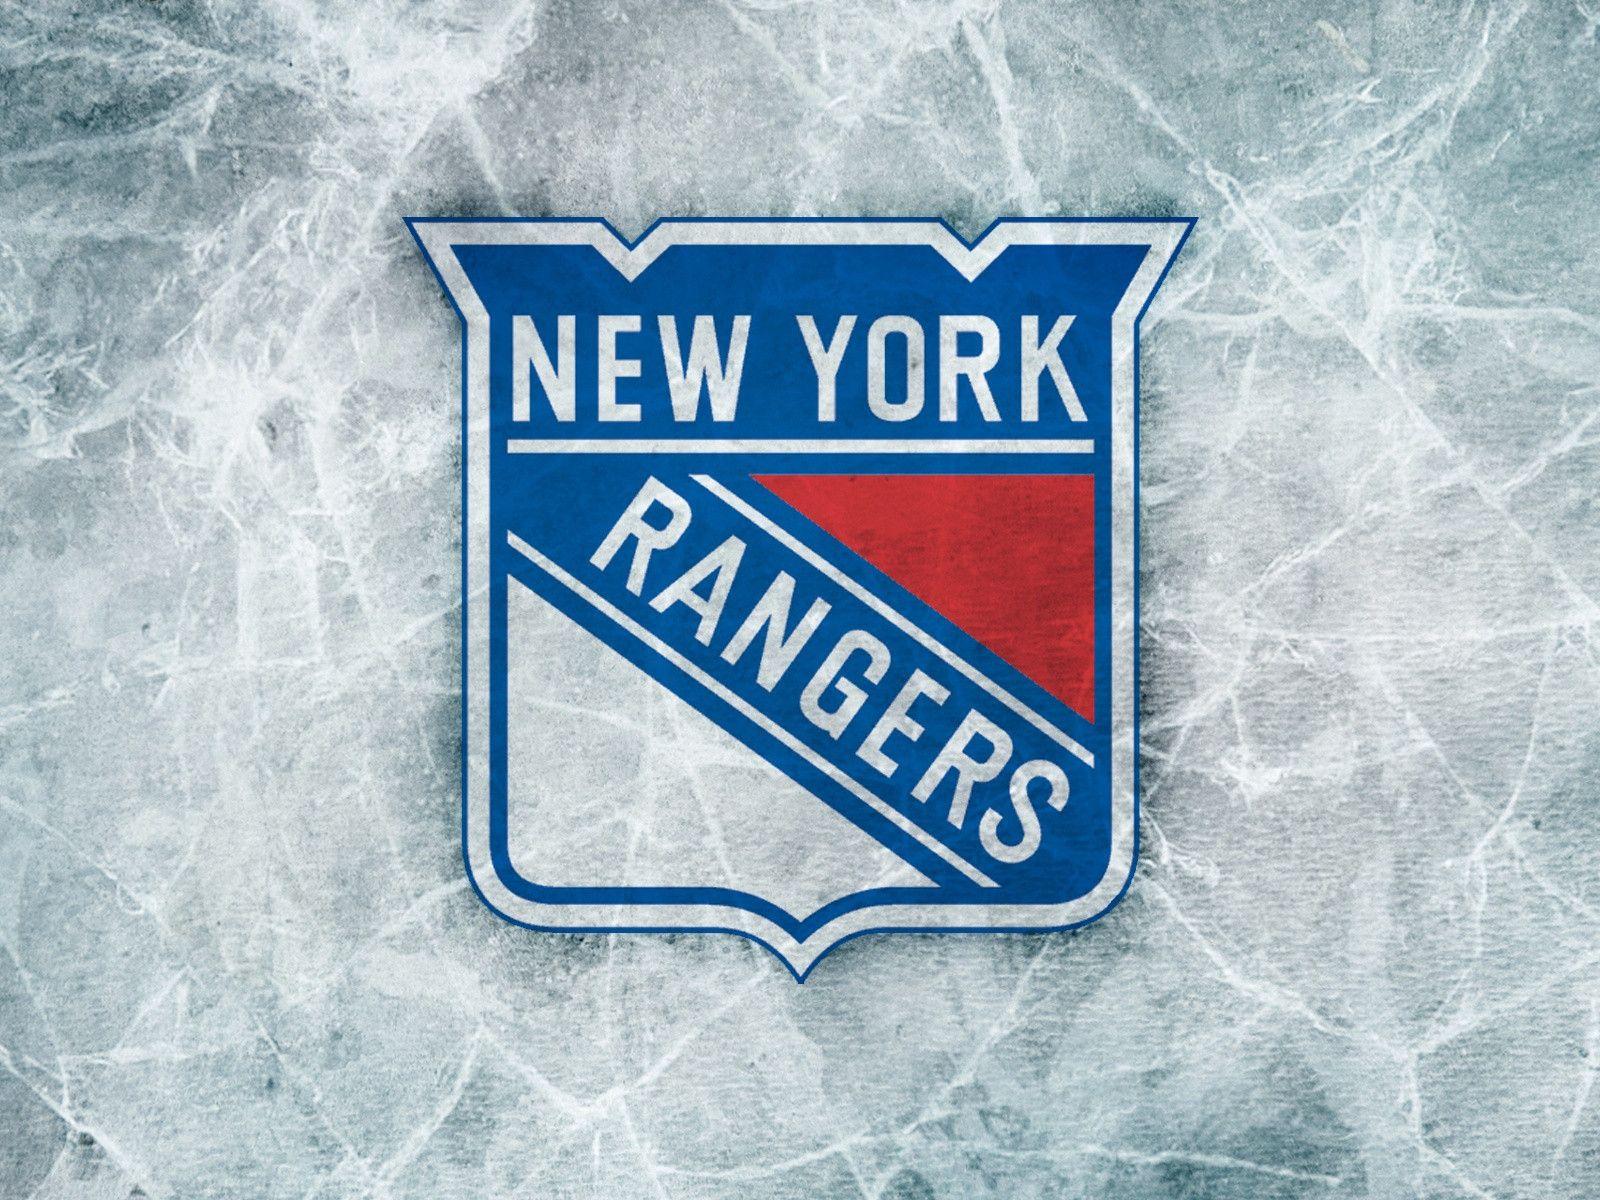 New York Rangers Wallpapers 1600x1200